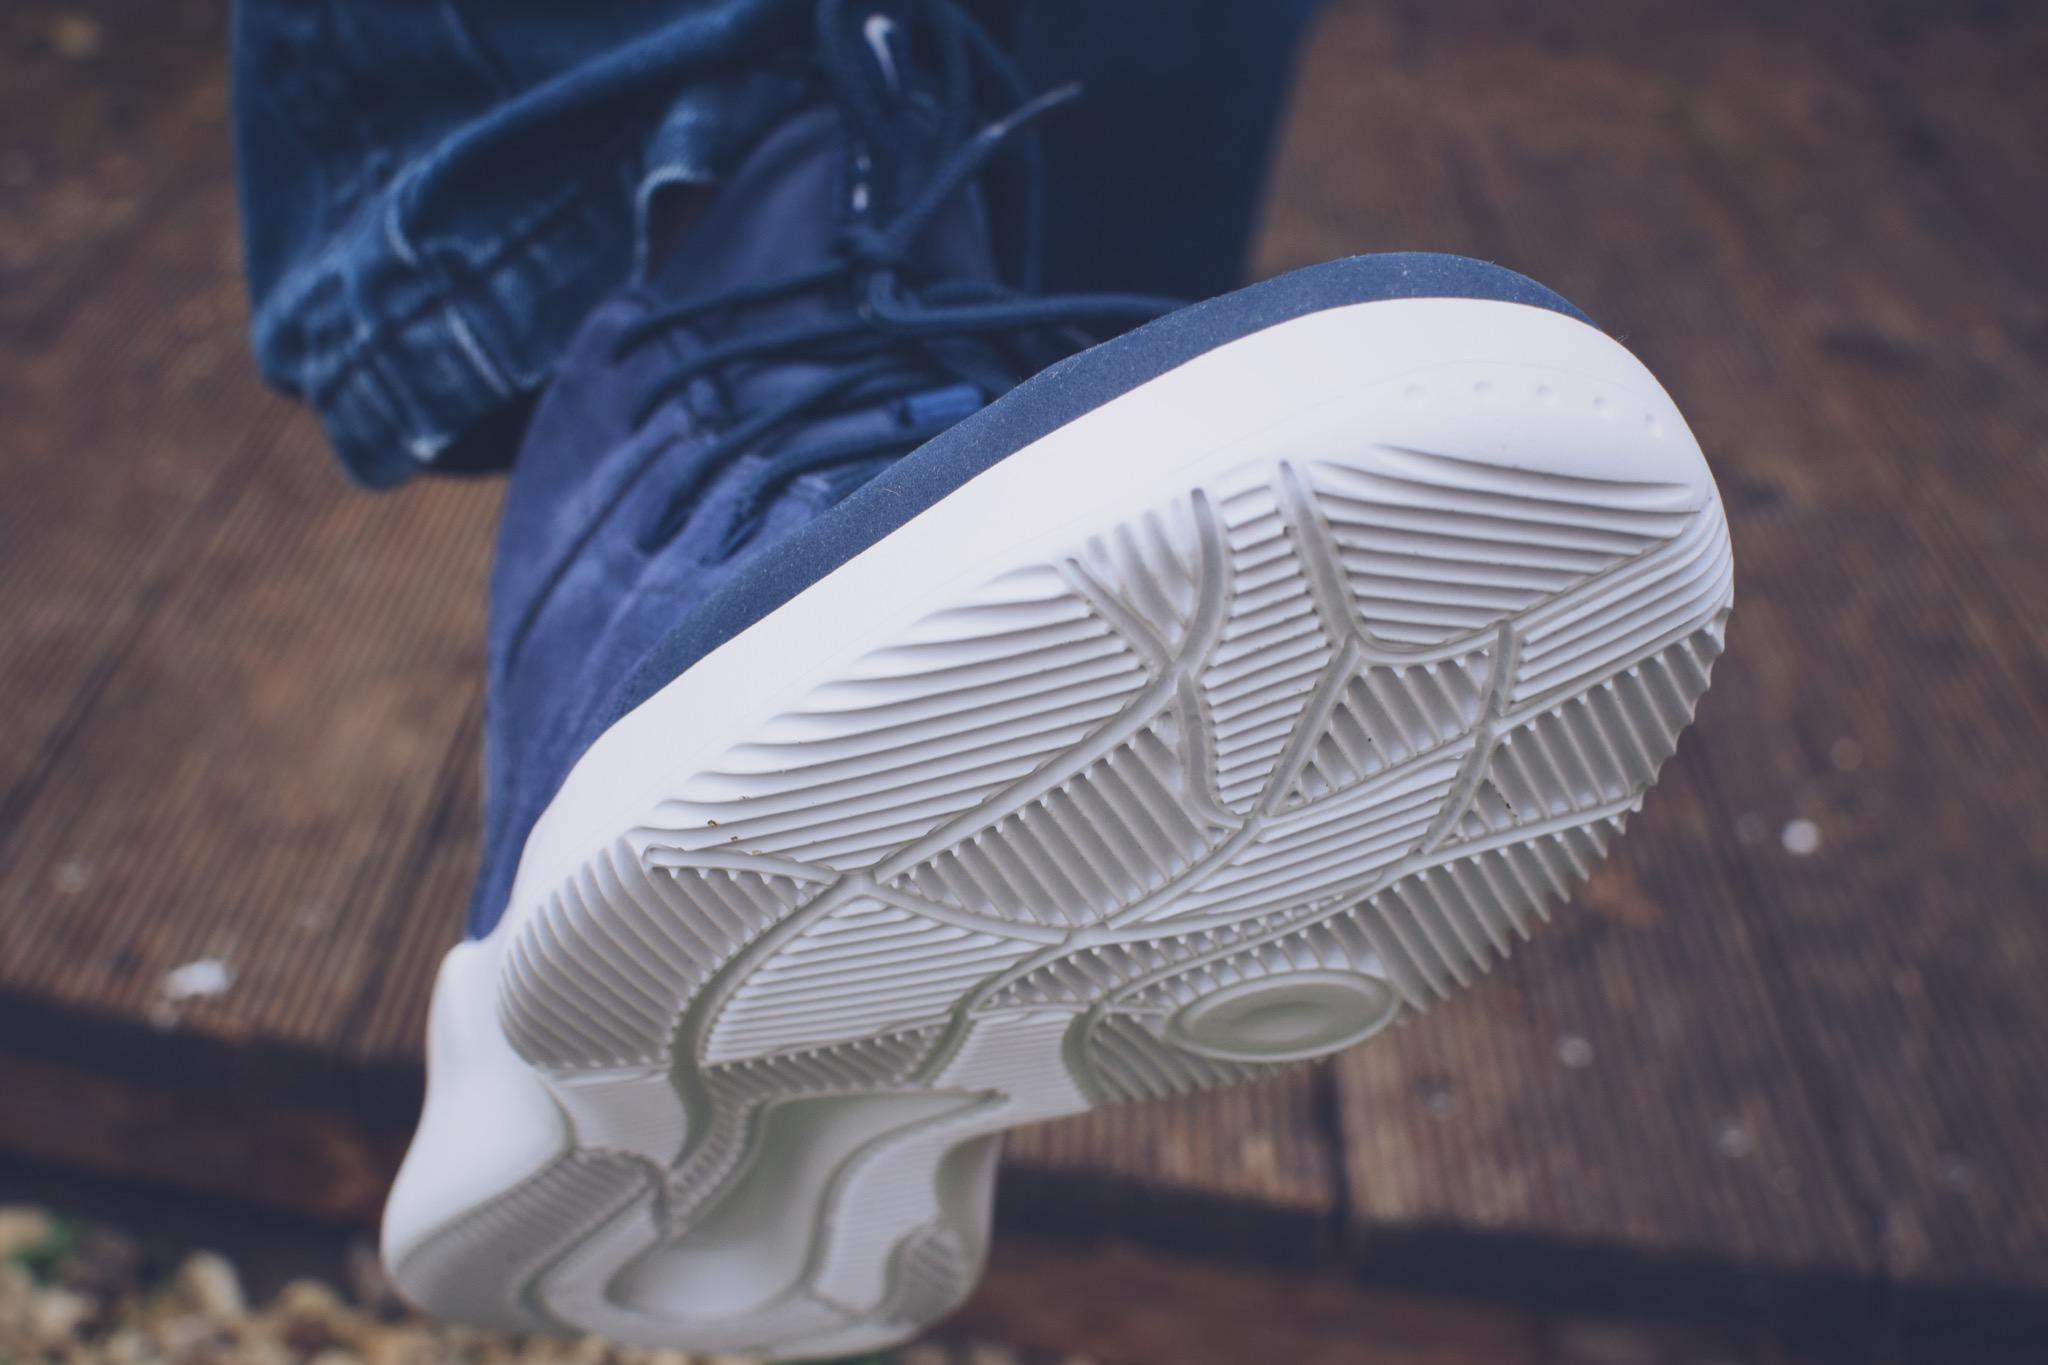 Nike_Hyperfuse_Foot_Locker_0170